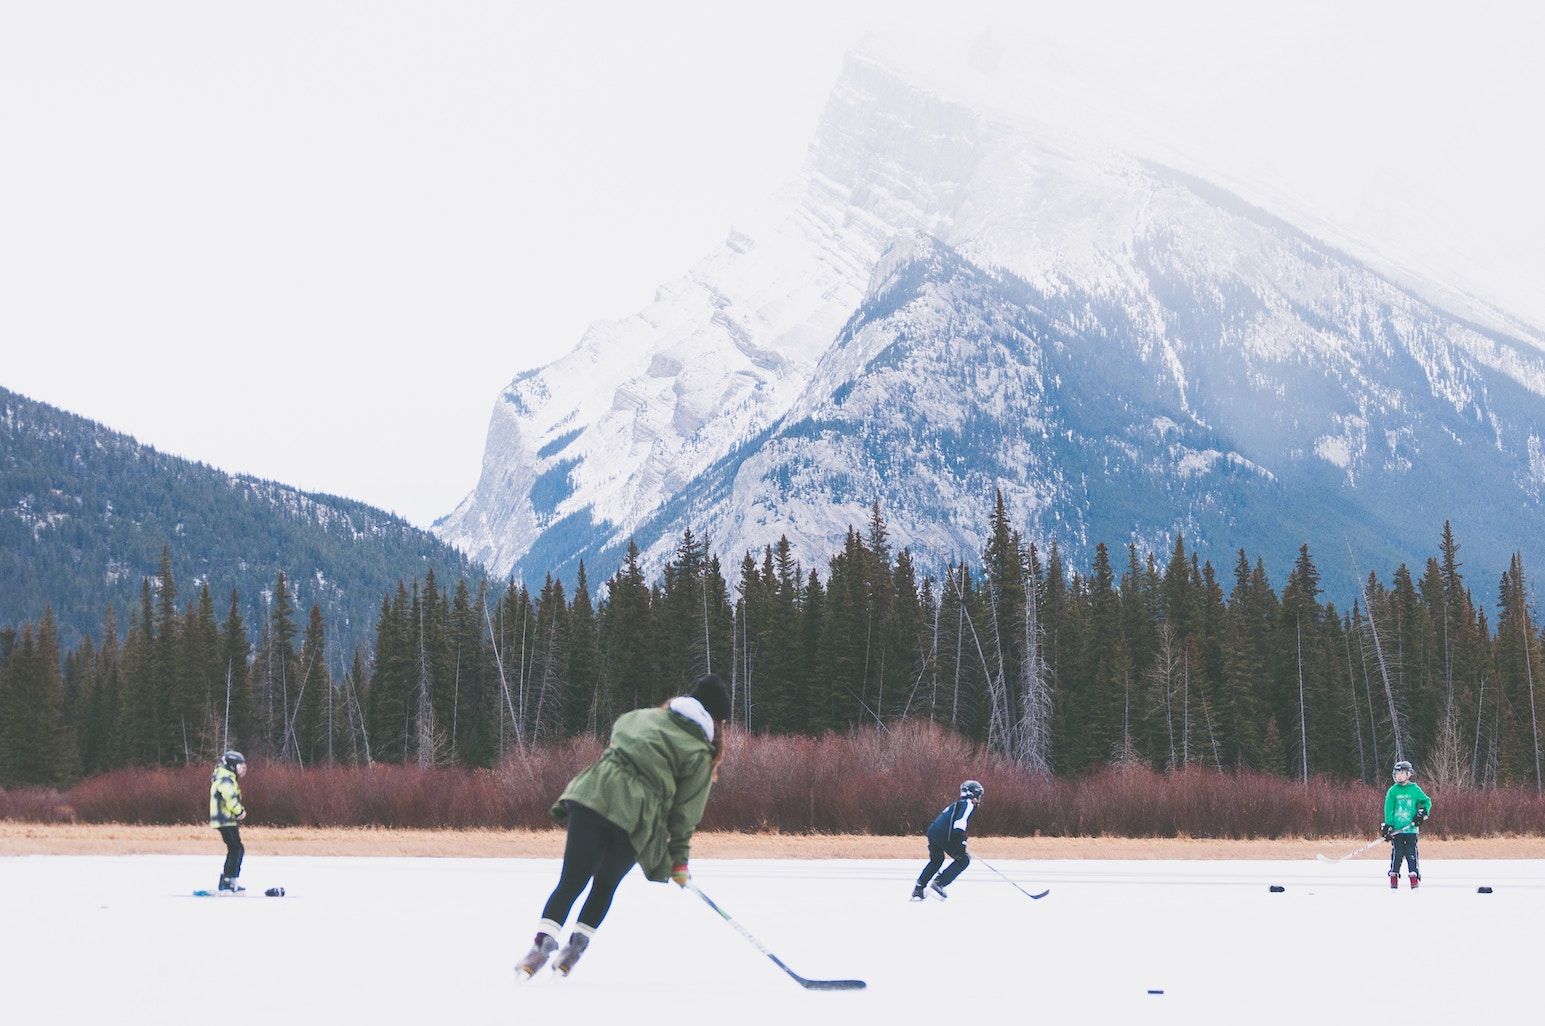 hockey sur glace en hiver au canada